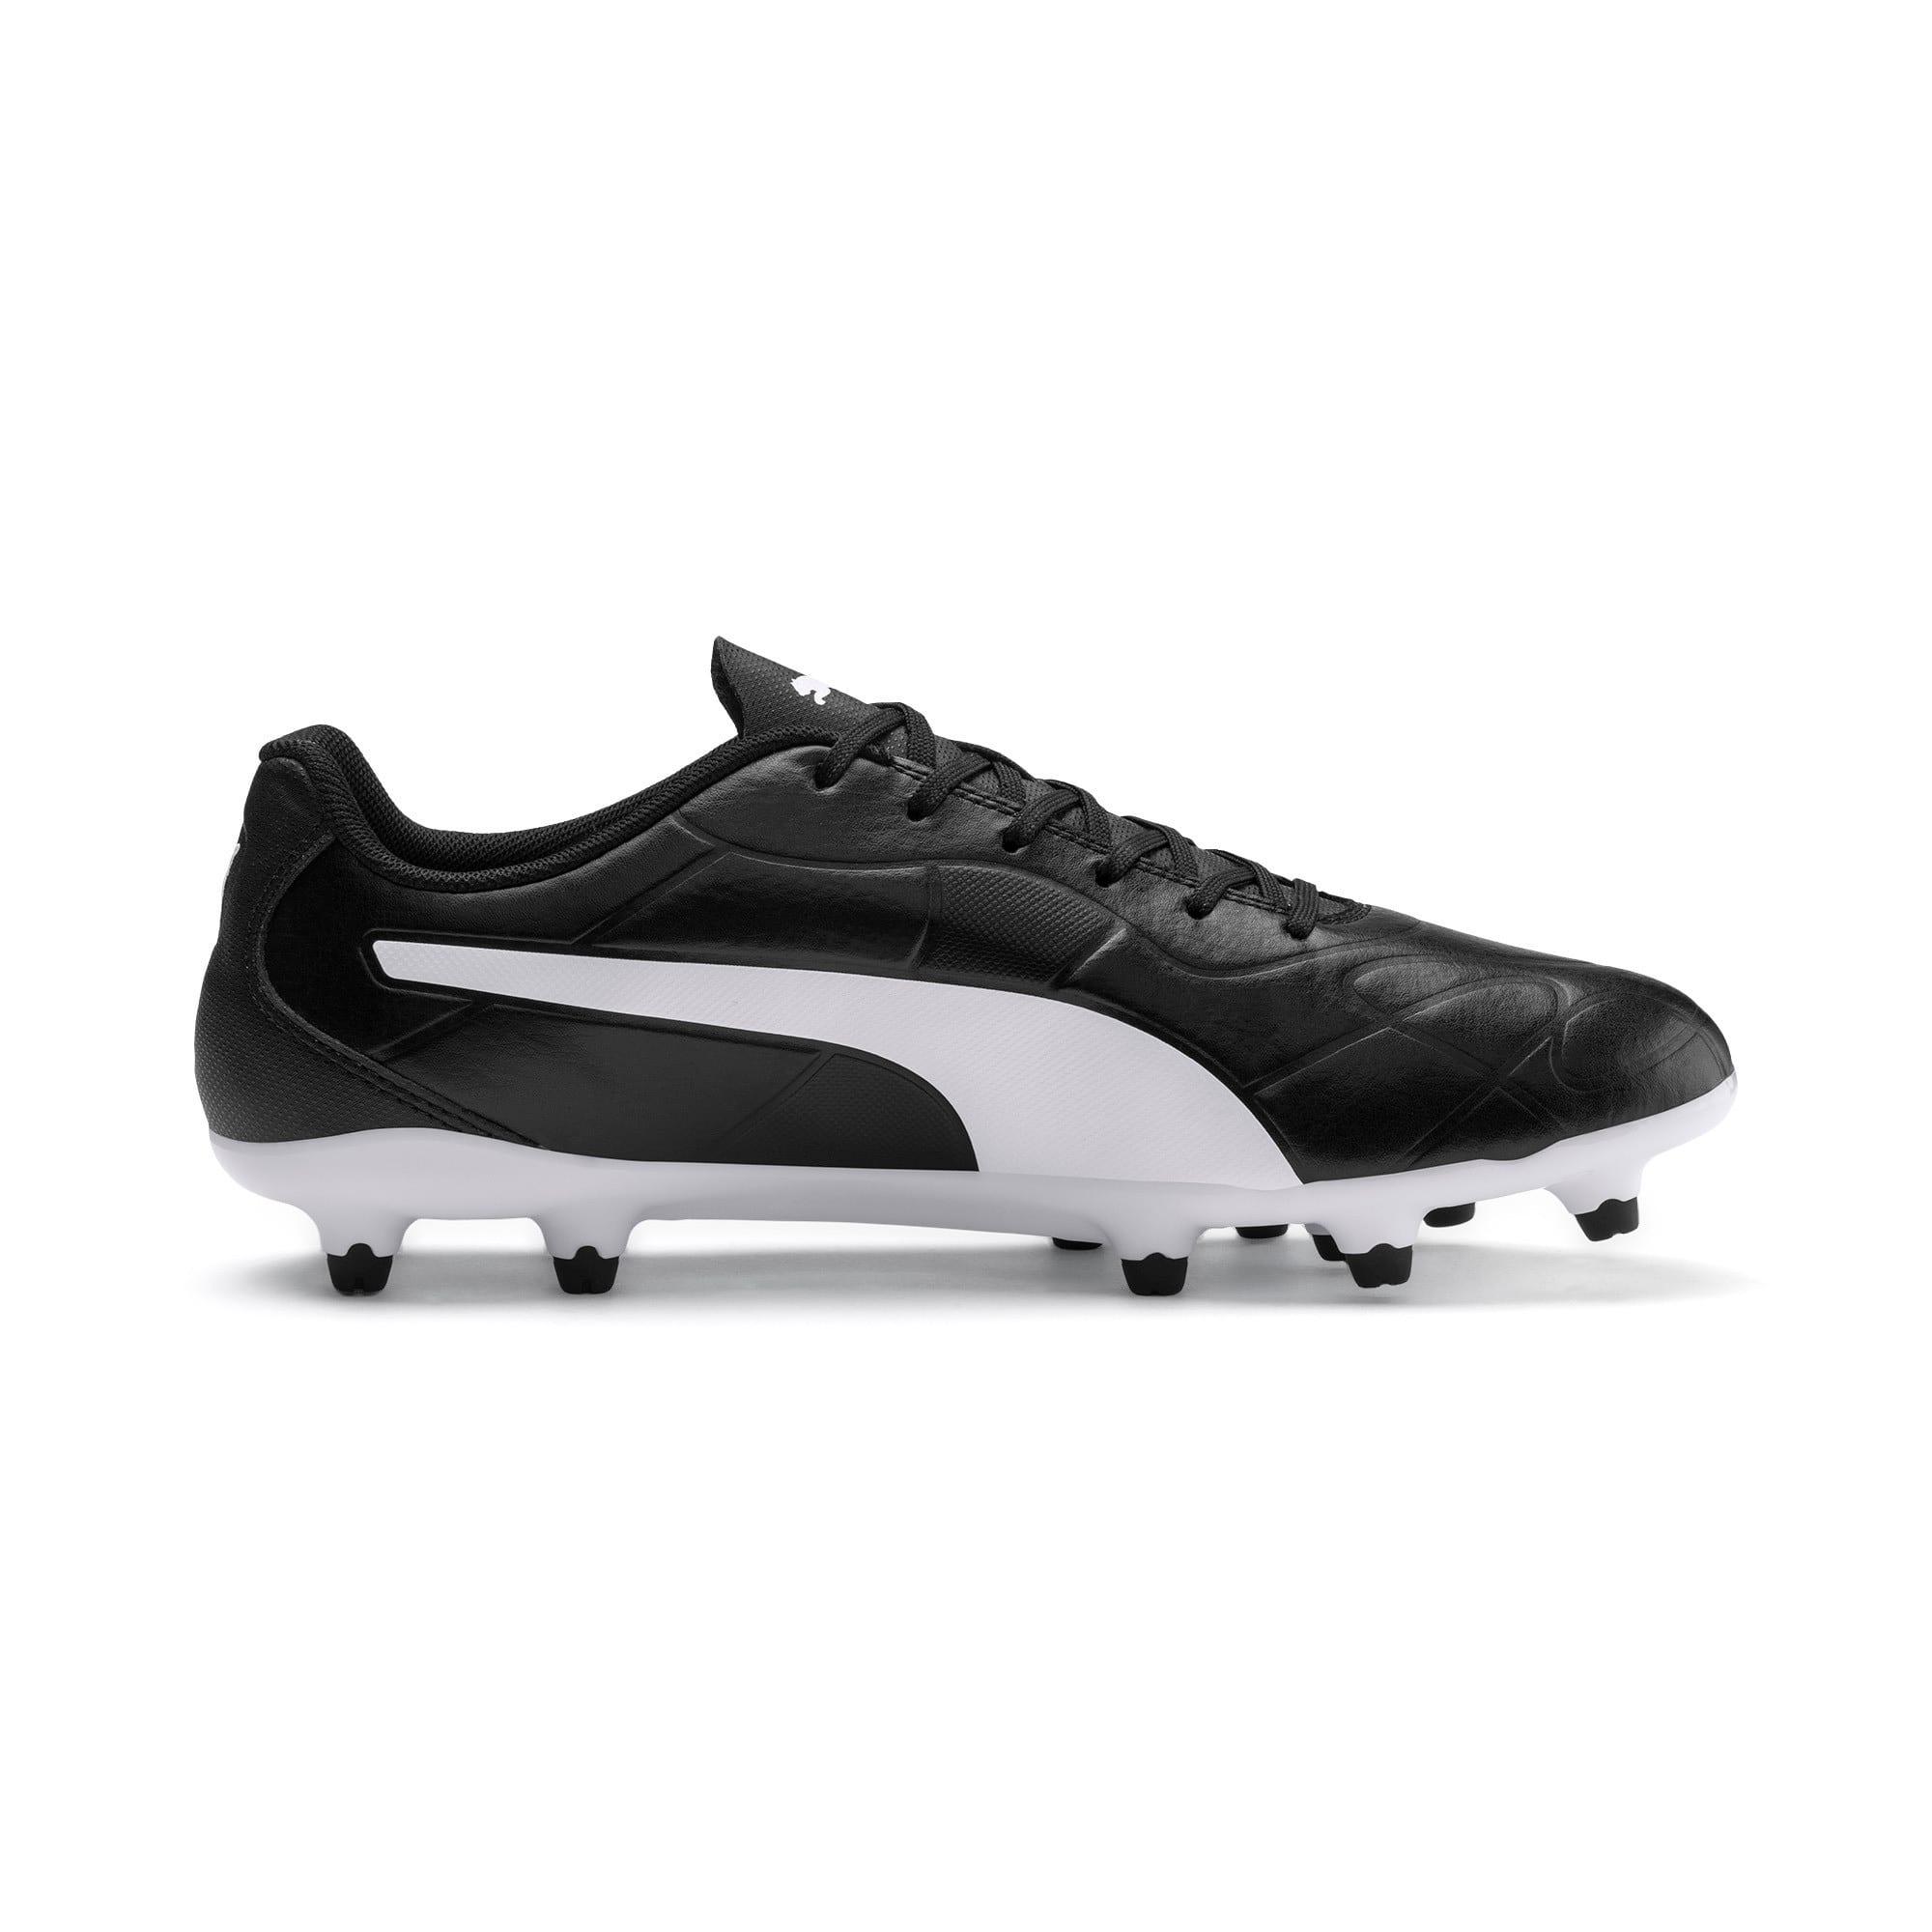 Thumbnail 7 of Monarch FG Men's Football Boots, Puma Black-Puma White, medium-IND